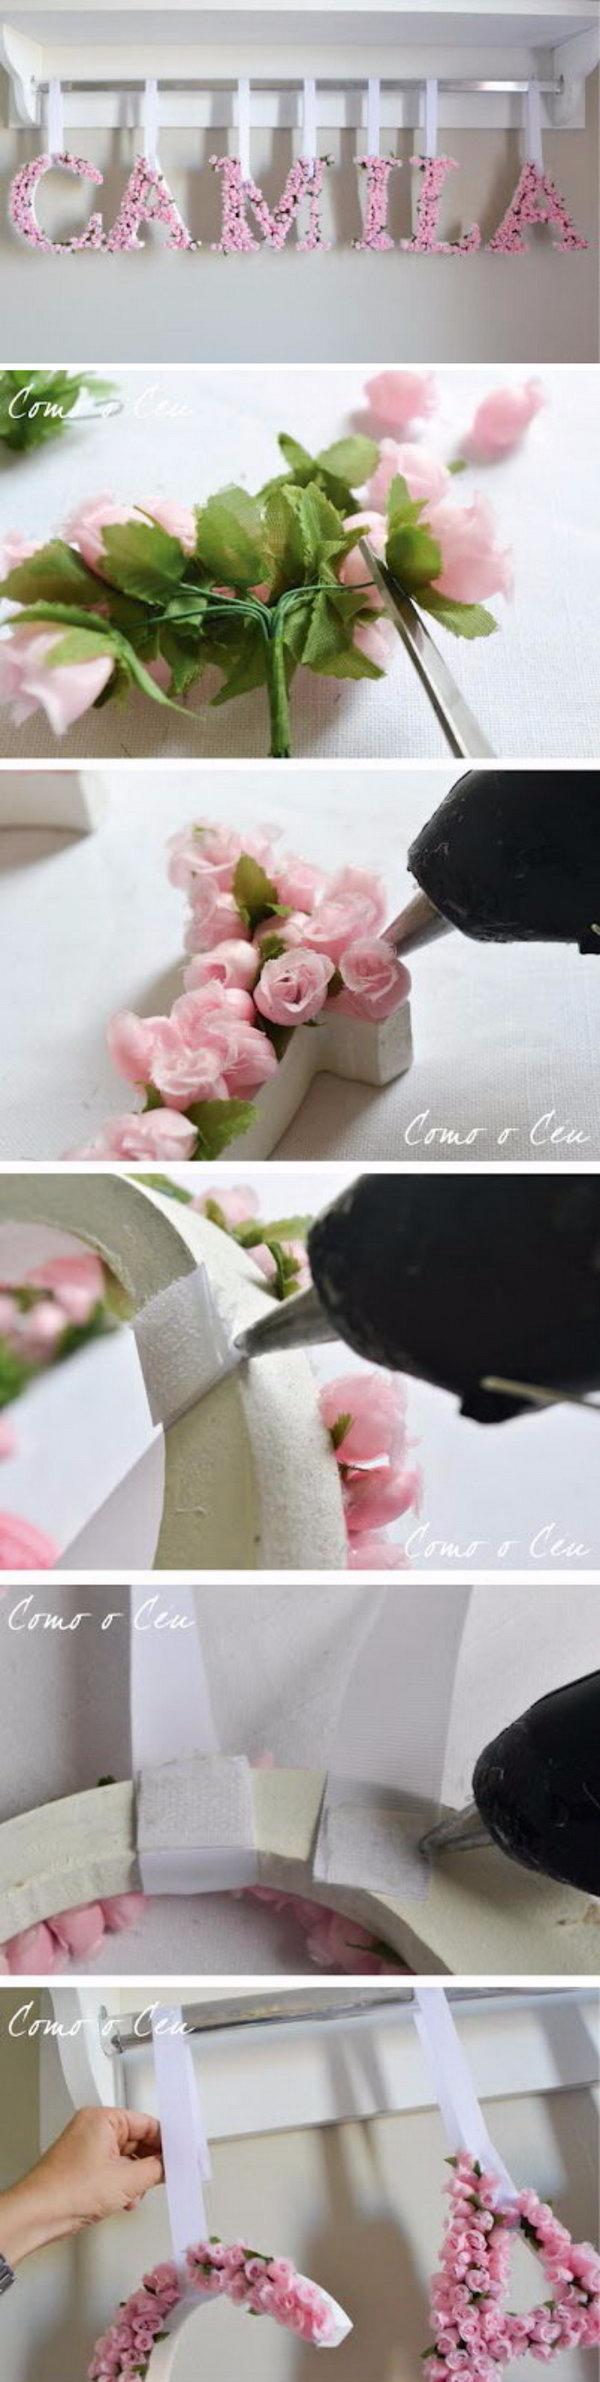 DIY Flower Letters.